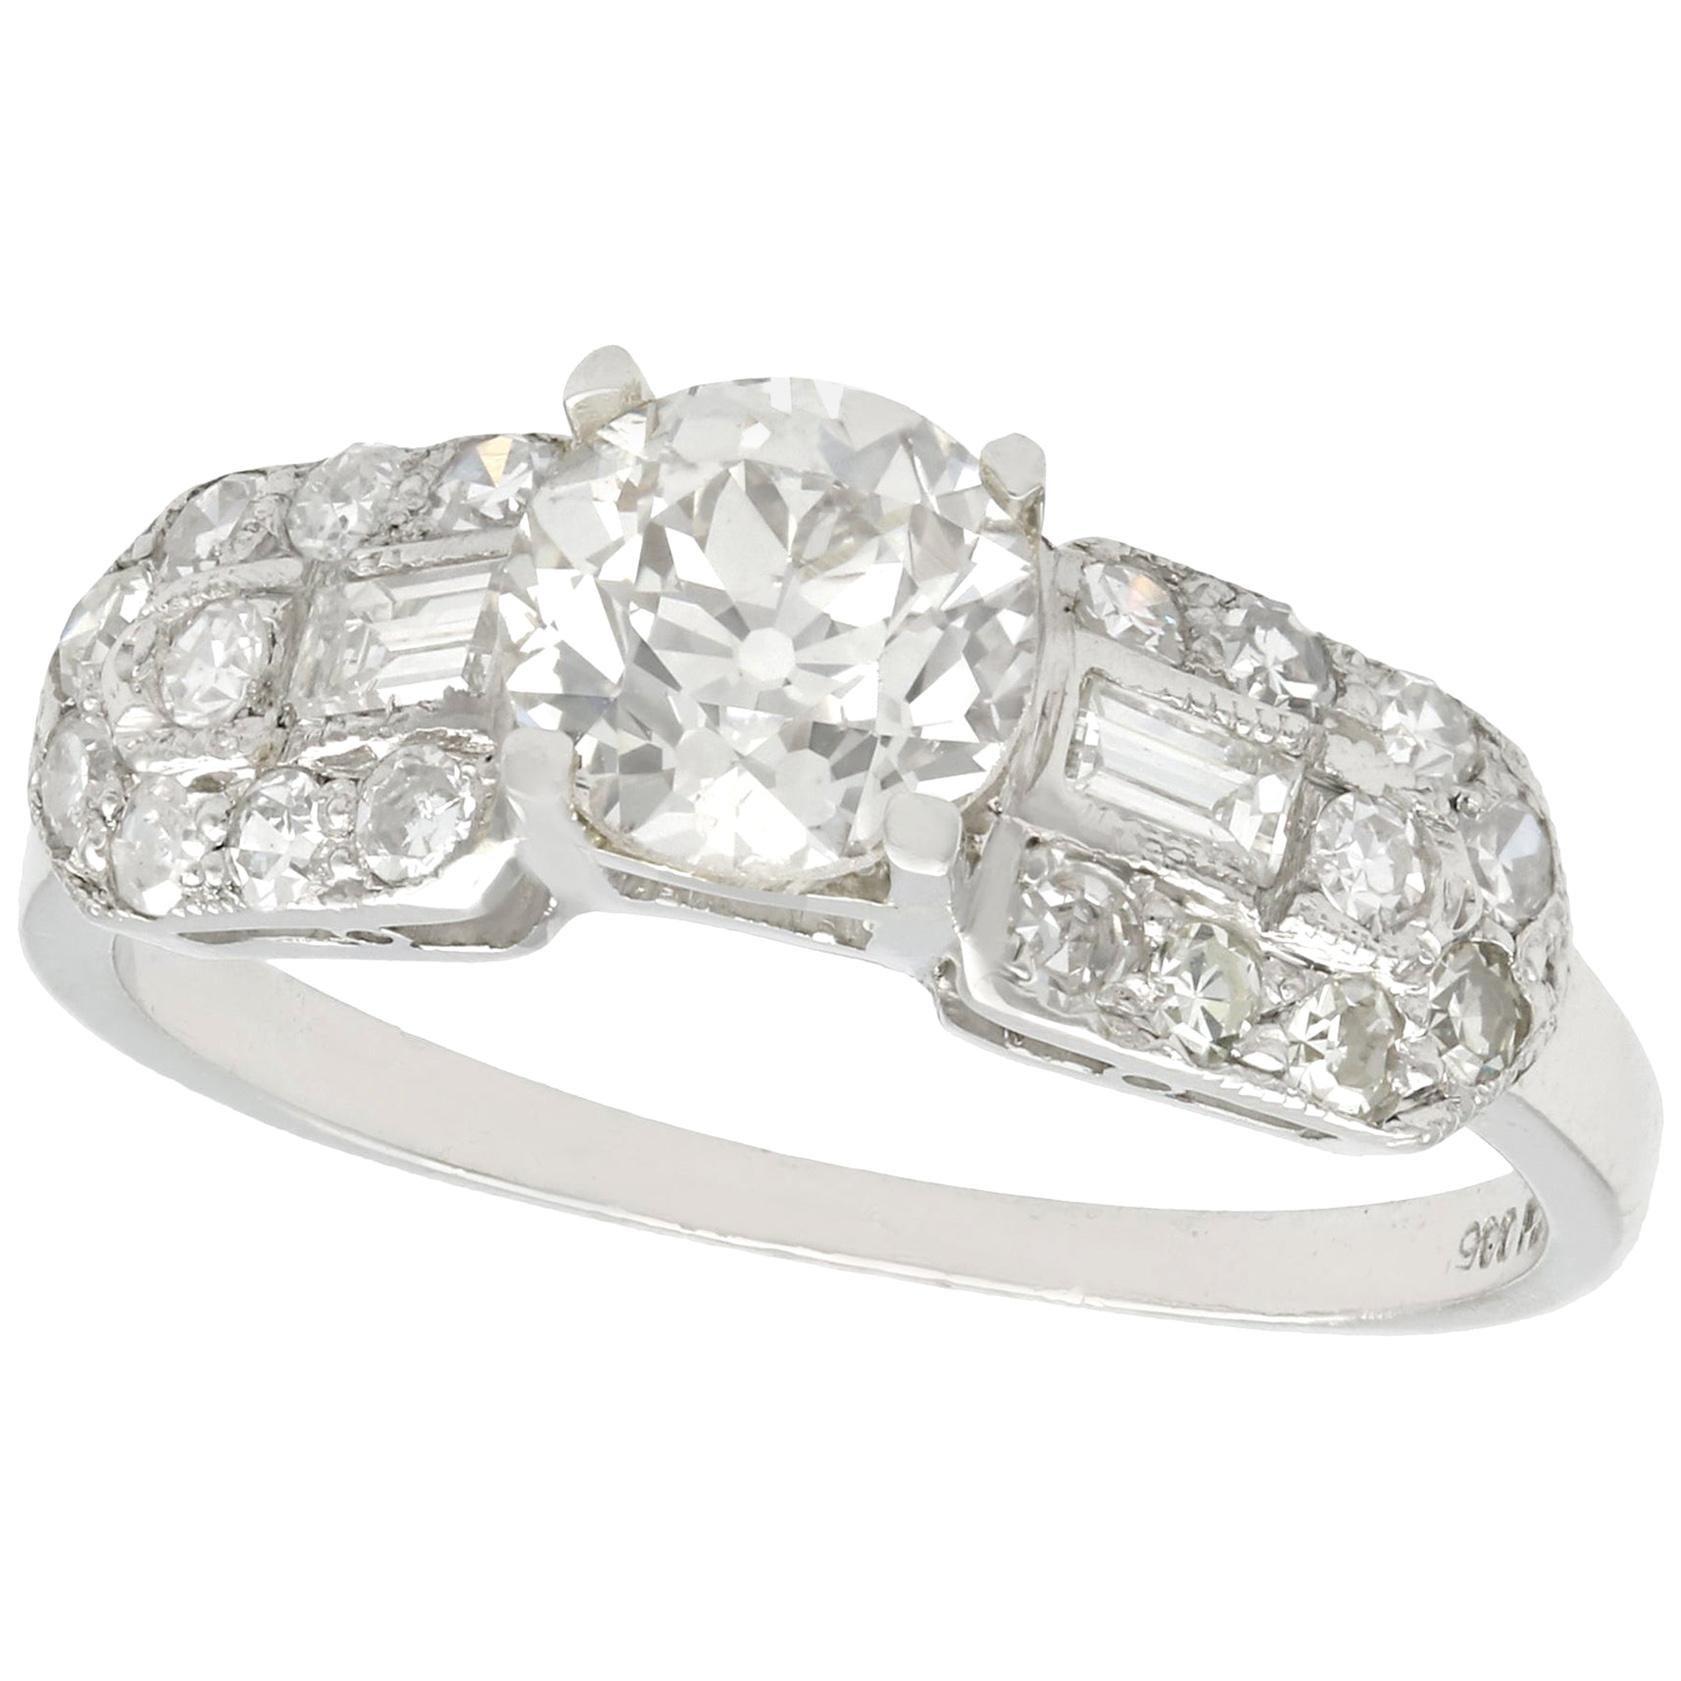 1940s 1.20 Carat Diamond and Platinum Cocktail Ring